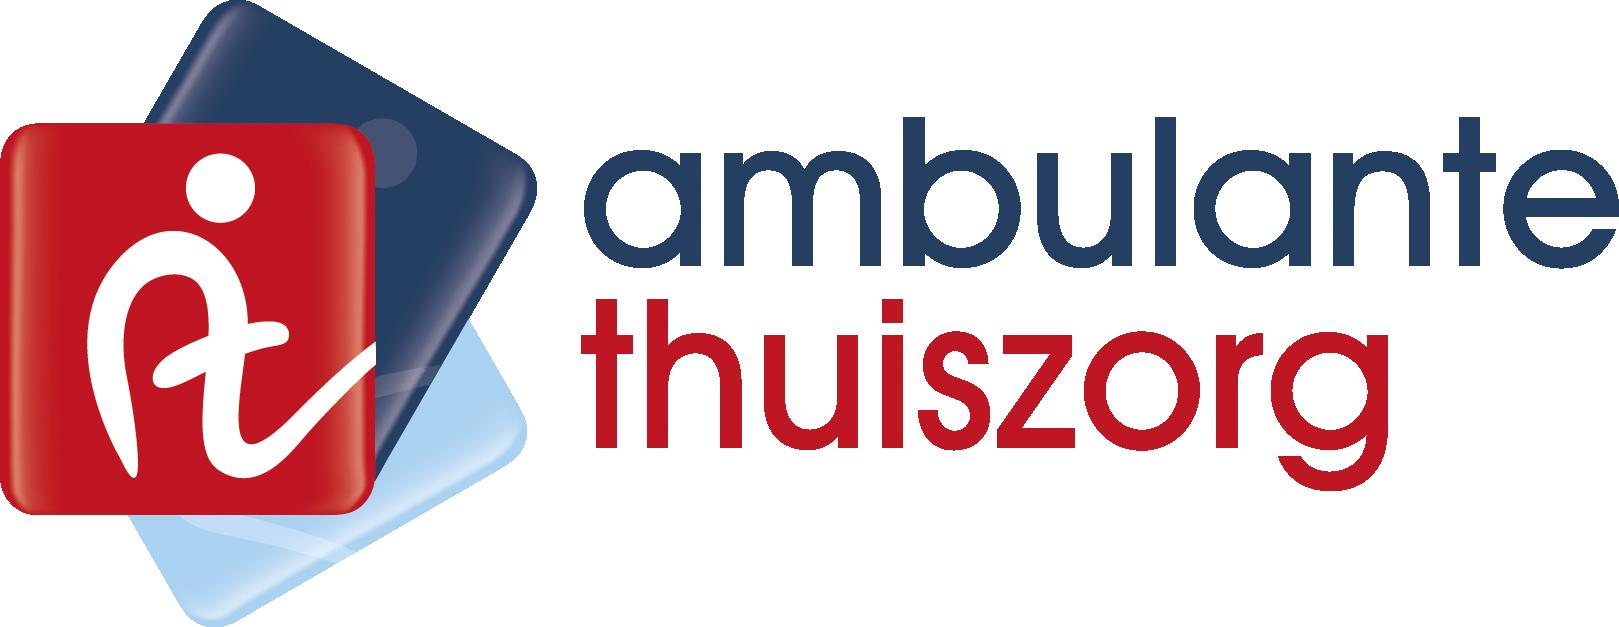 Ambulante Thuiszorg